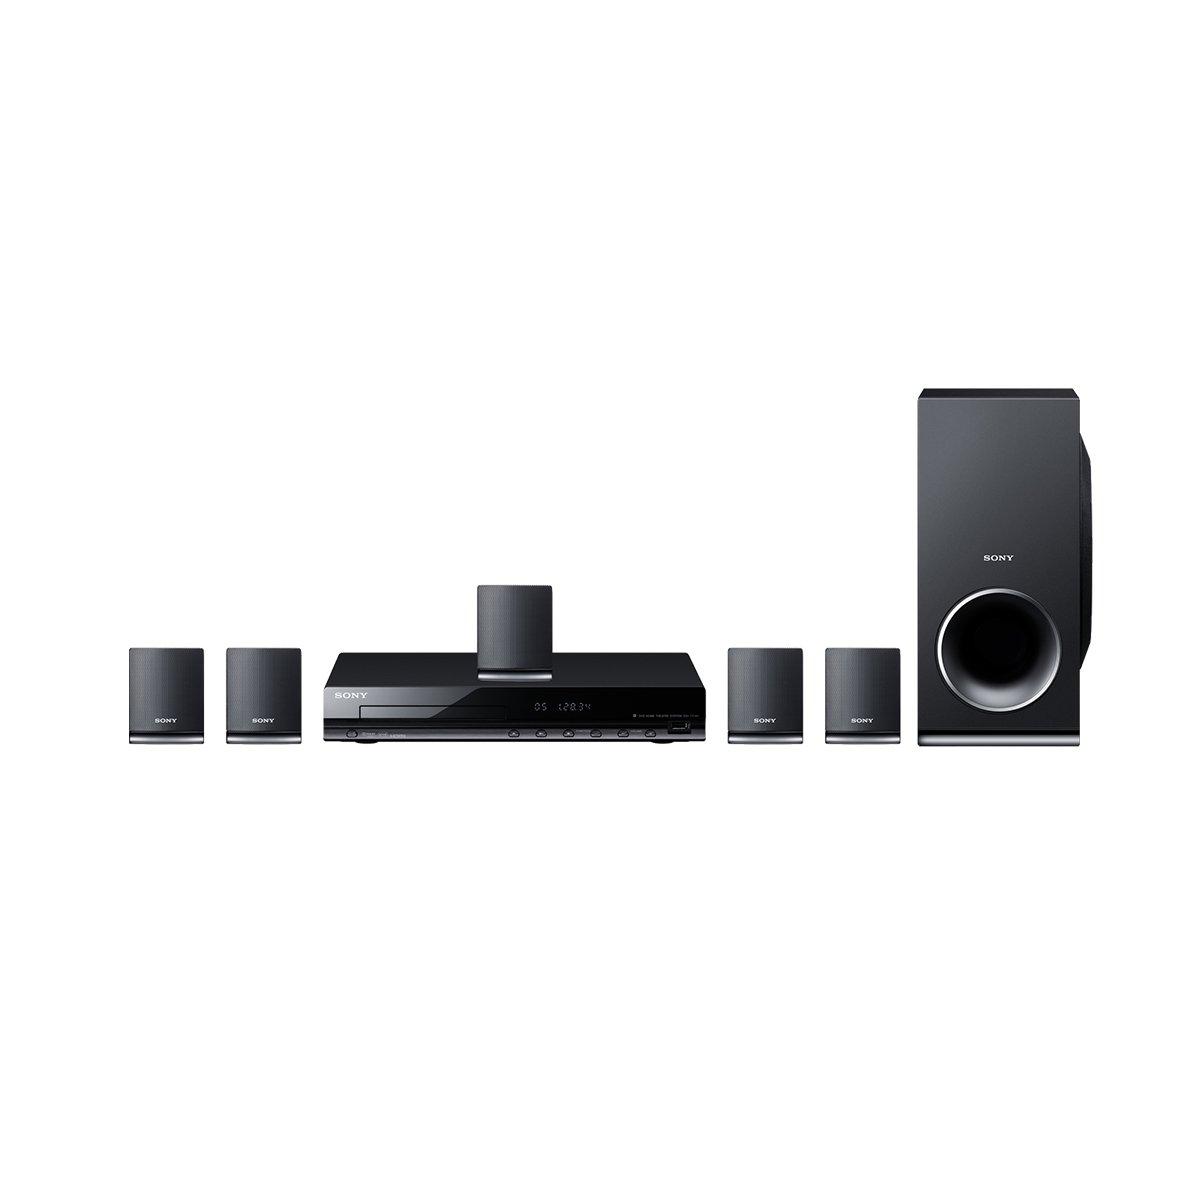 e6cf86c03 Sony DAV-TZ145 Real 5.1ch Dolby Digital DVD Home  Amazon.in  Electronics